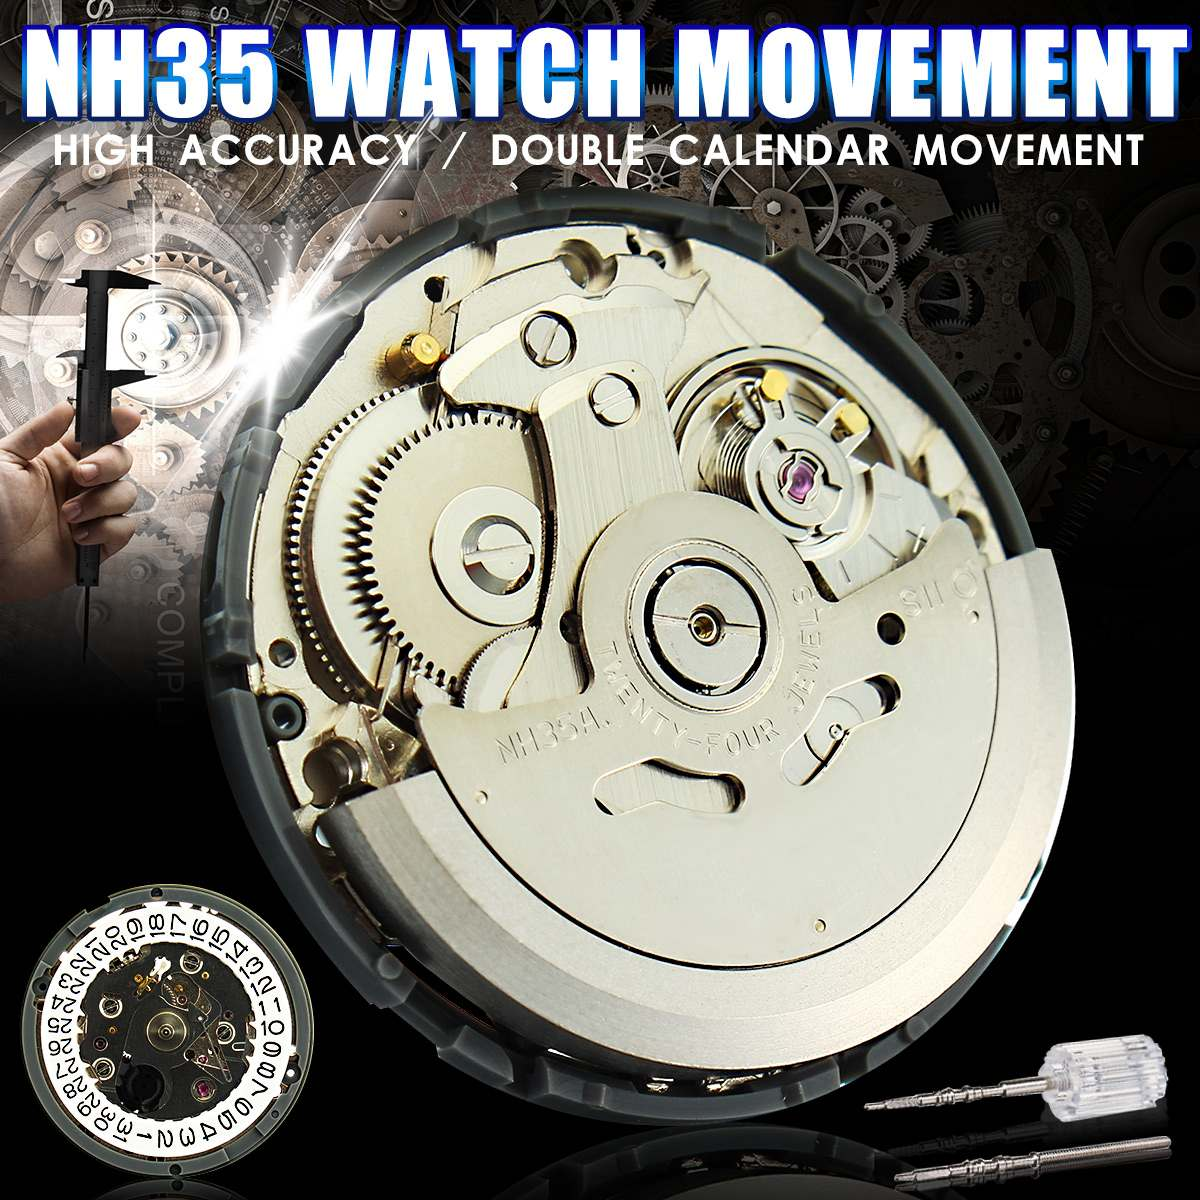 Japan Echtem NH35 Armbanduhr Bewegung Mechanische Uhr Bewegung Automatische Großhandel Neue Ankunft